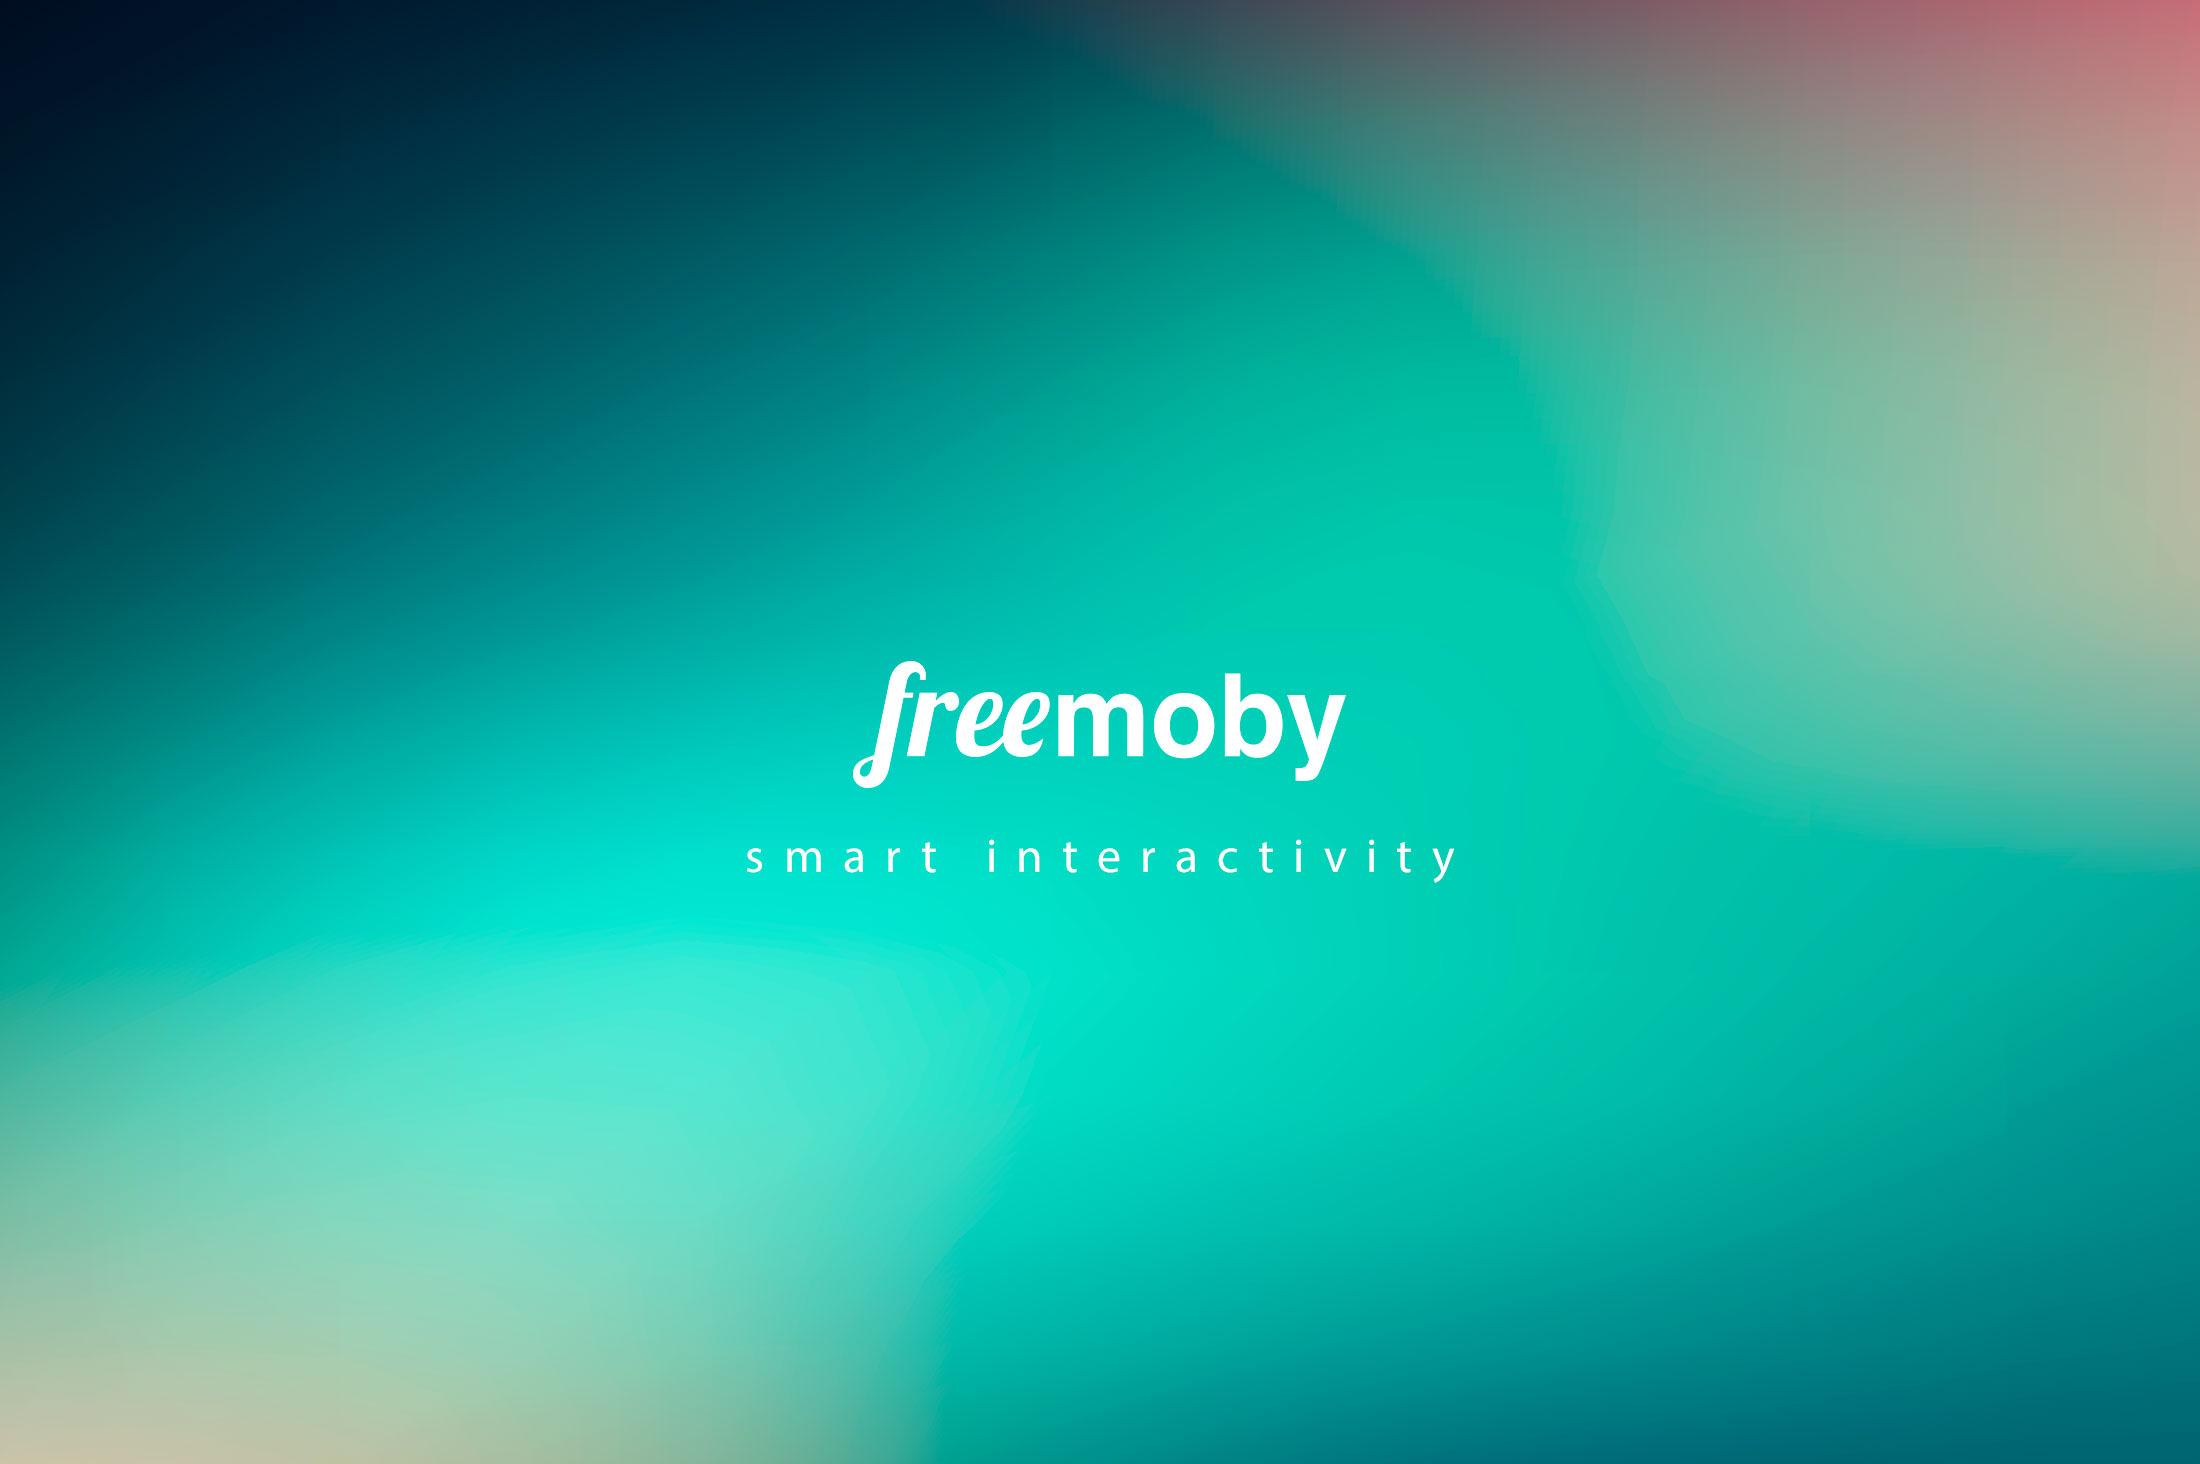 Freemoby-01